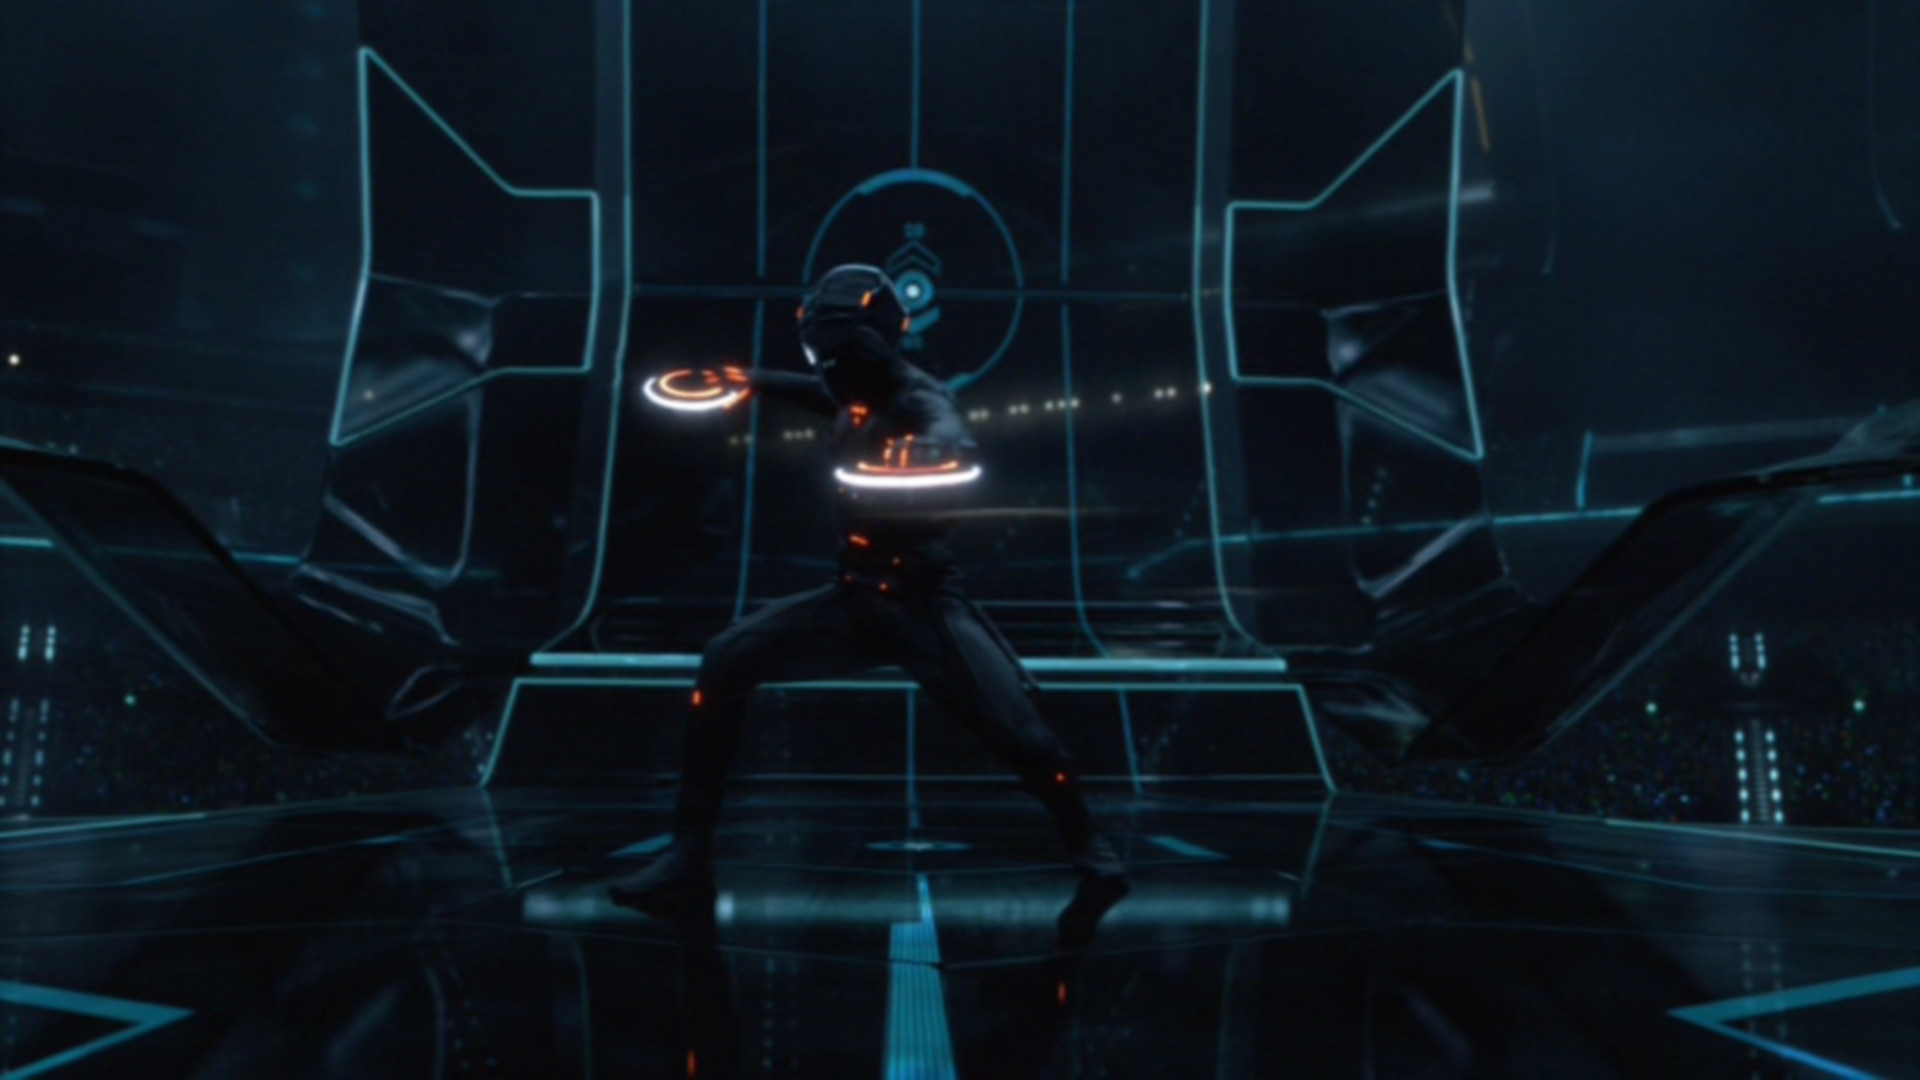 Tron: Legacy / Tron: The Original Classic (Blu-ray) : DVD Talk Review of  the Blu-ray